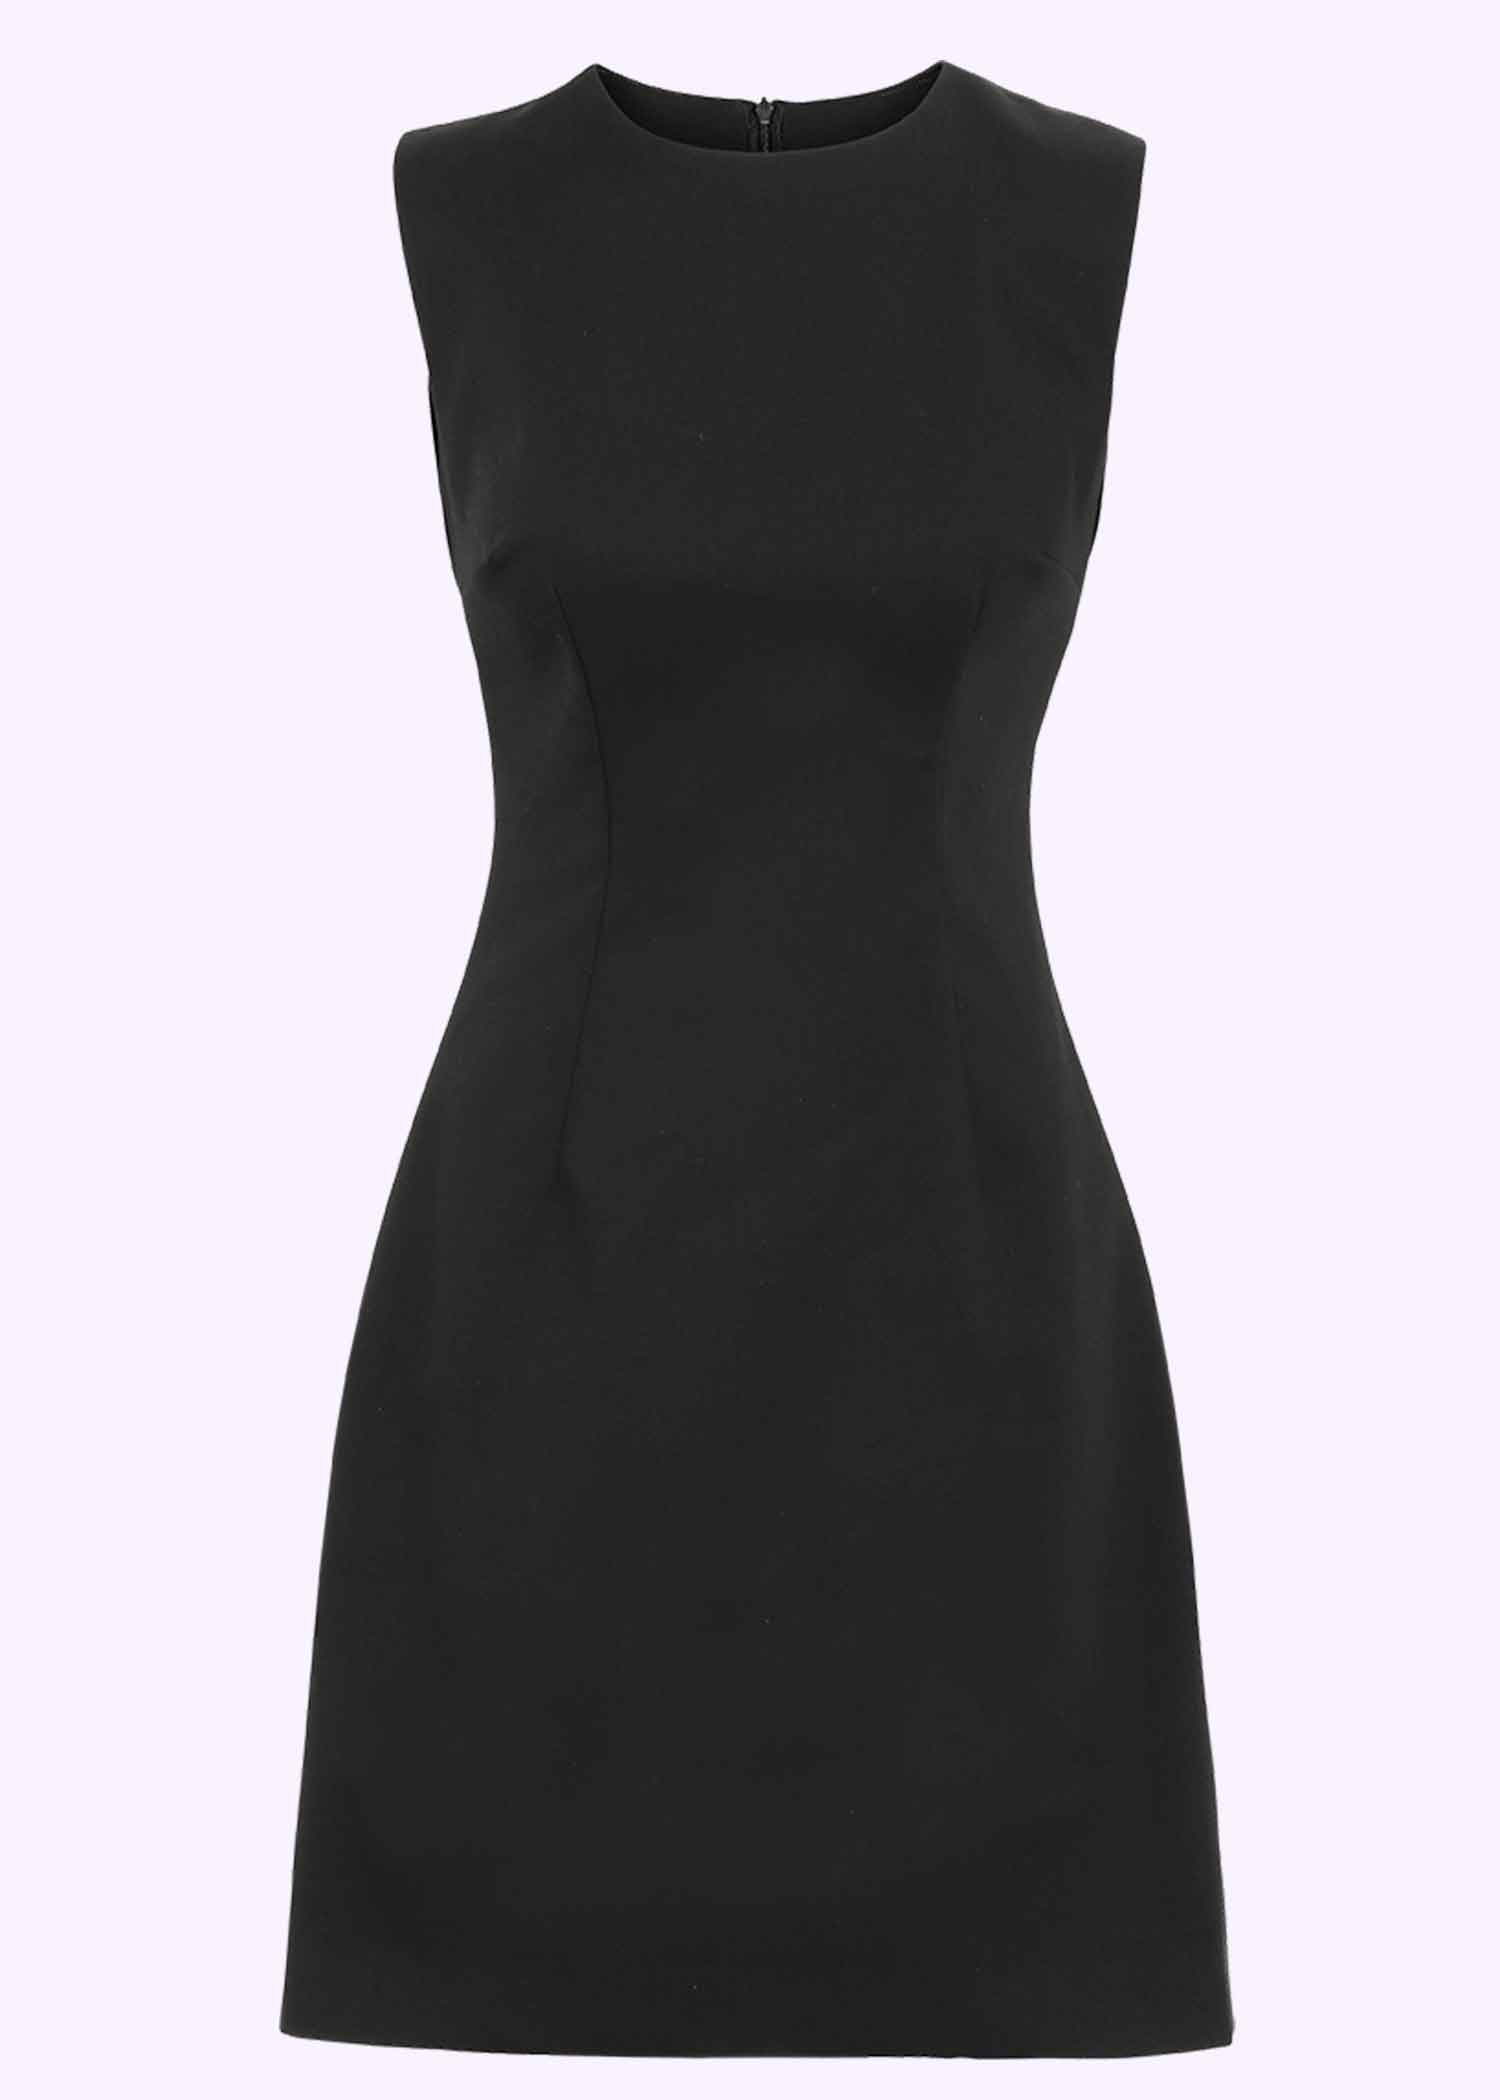 Classic 60s Mini dress in black from Marmalade